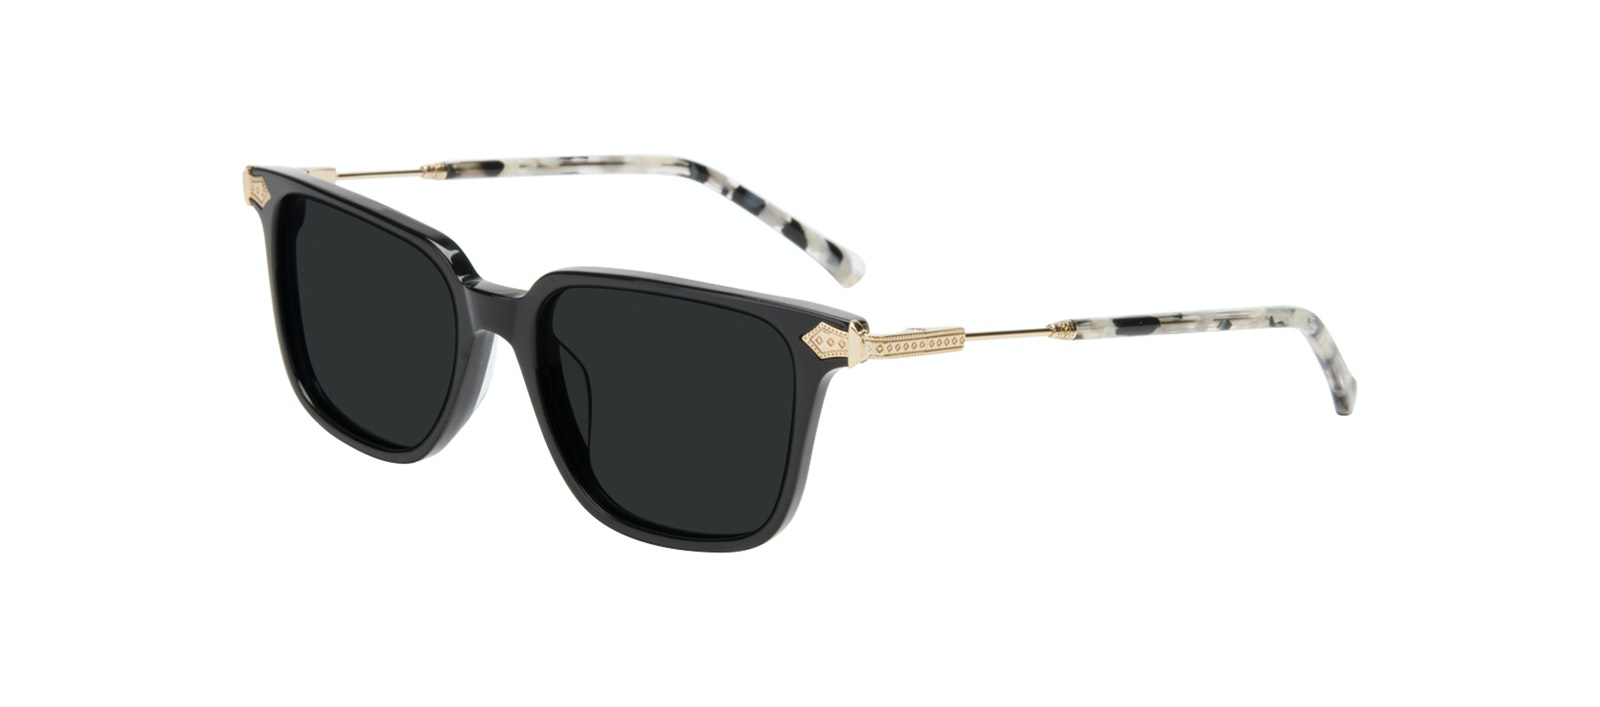 Affordable Fashion Glasses Square Sunglasses Women Twinkle Onyx Marble Tilt